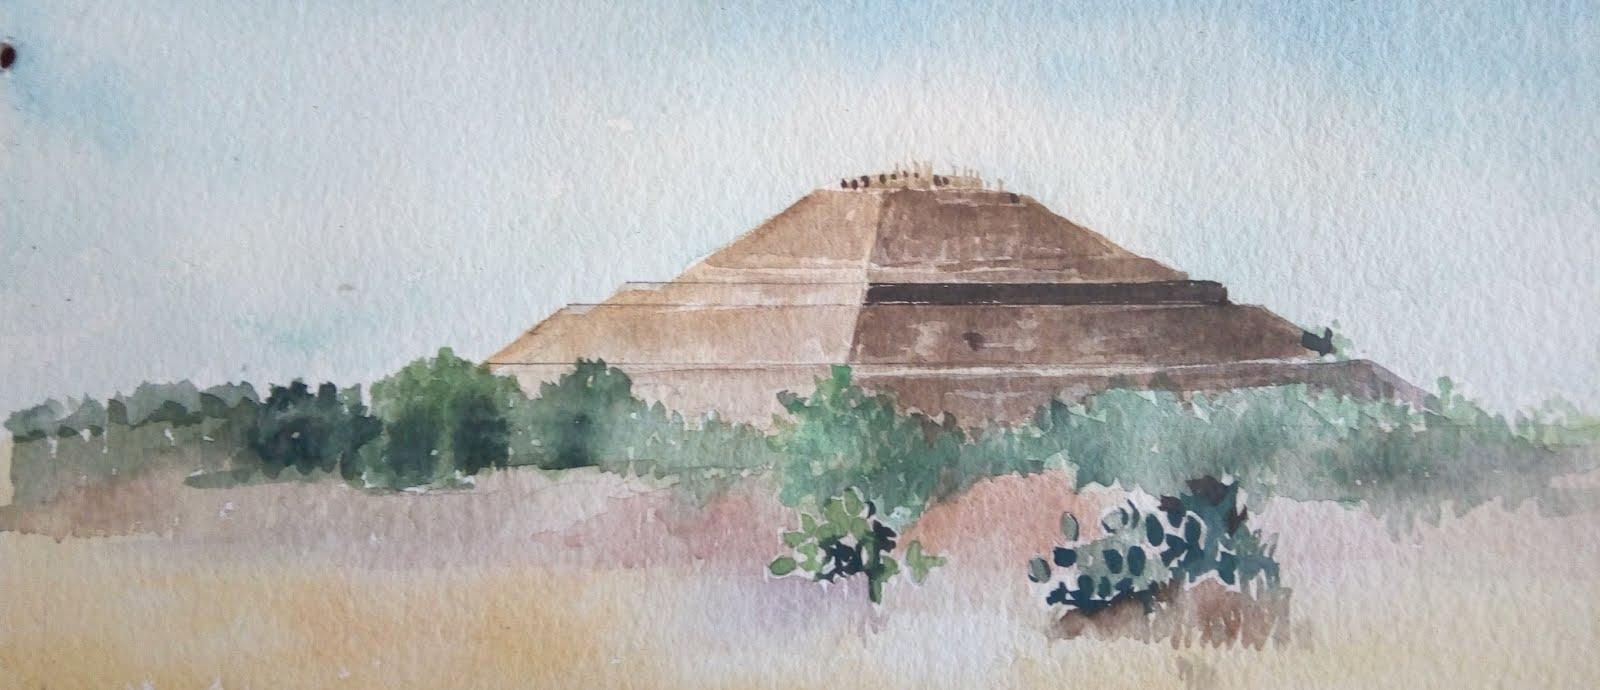 Teotihuacán, Edomex